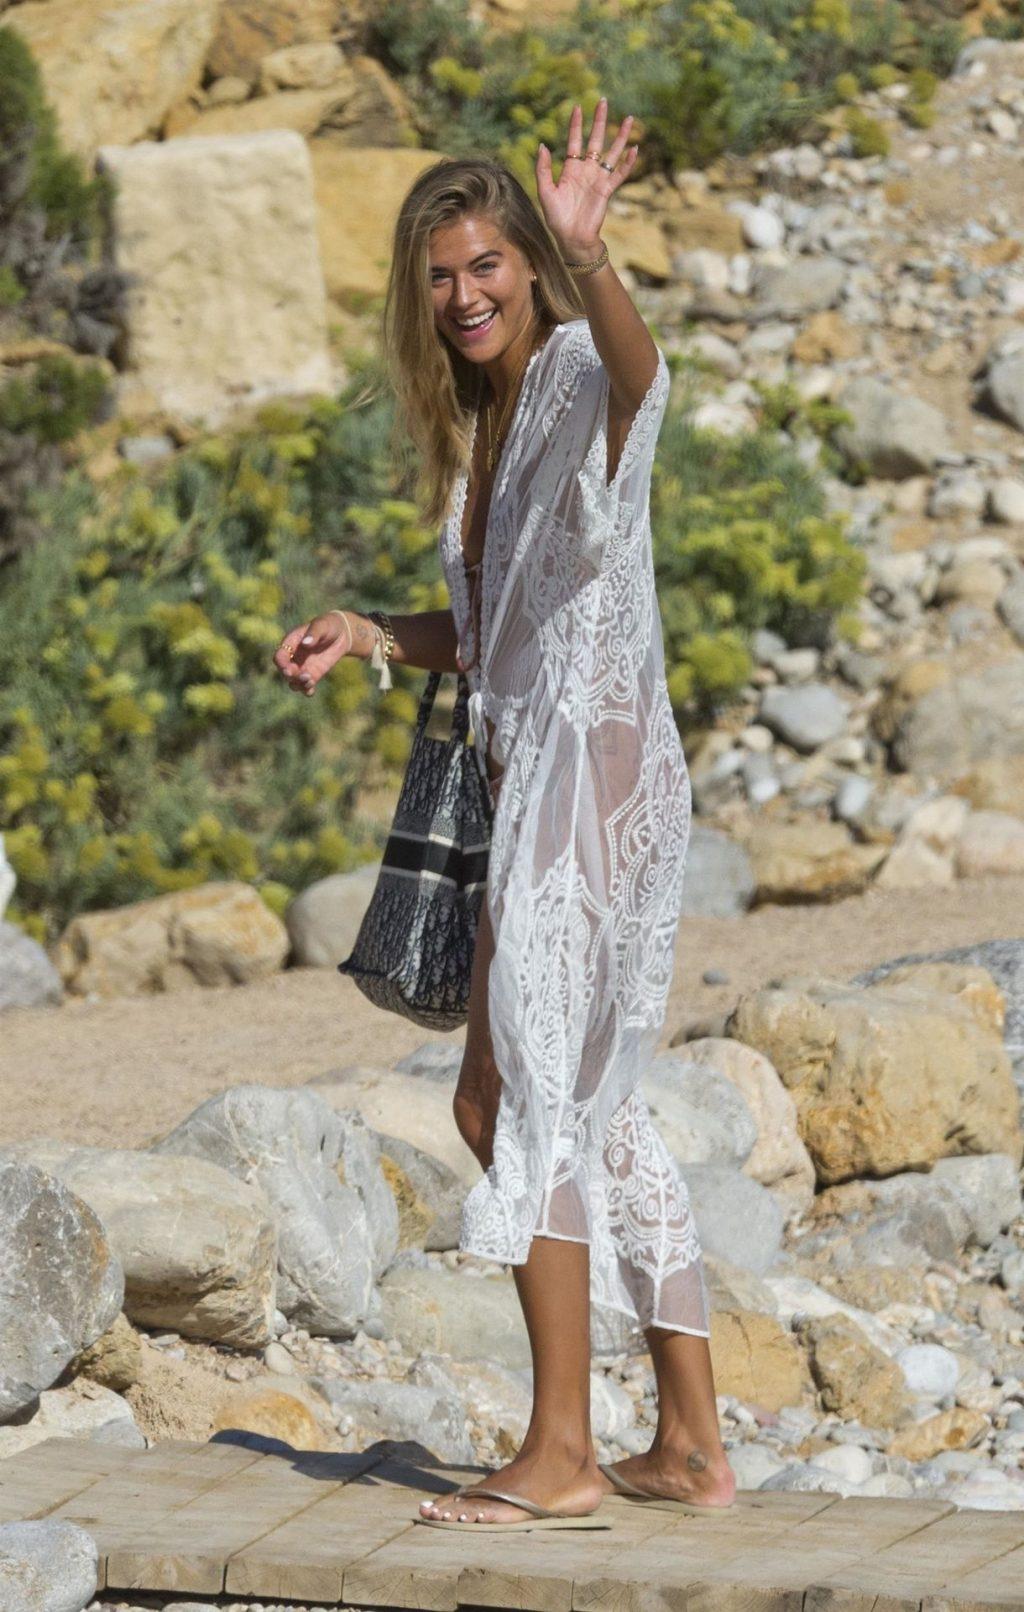 Arabella Chi Looks Stunning in Her Skimpy Bikini Set in Ibiza (45 Photos)